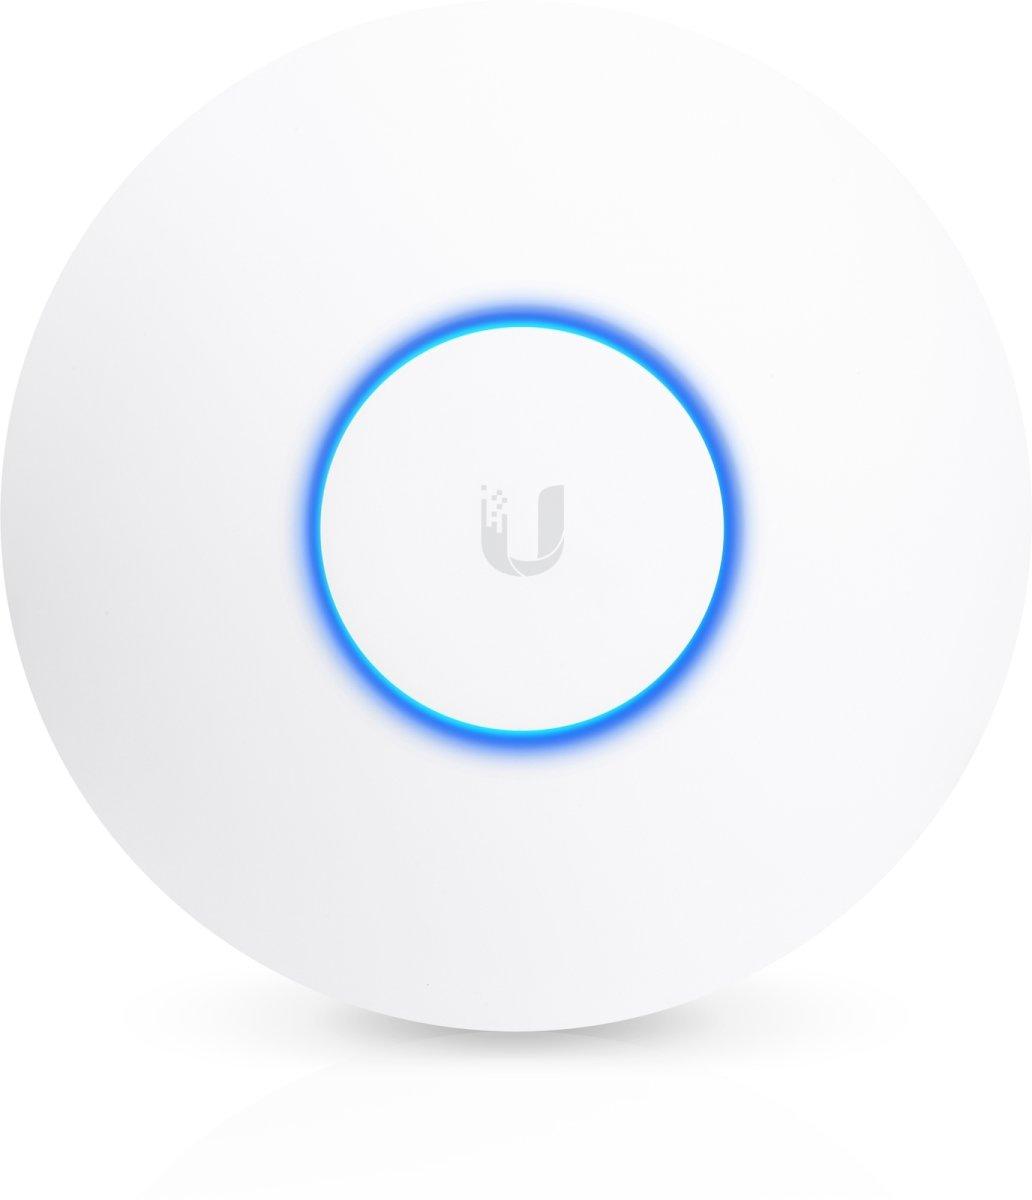 Ubiquiti UAP-AC-HD High Density Access point